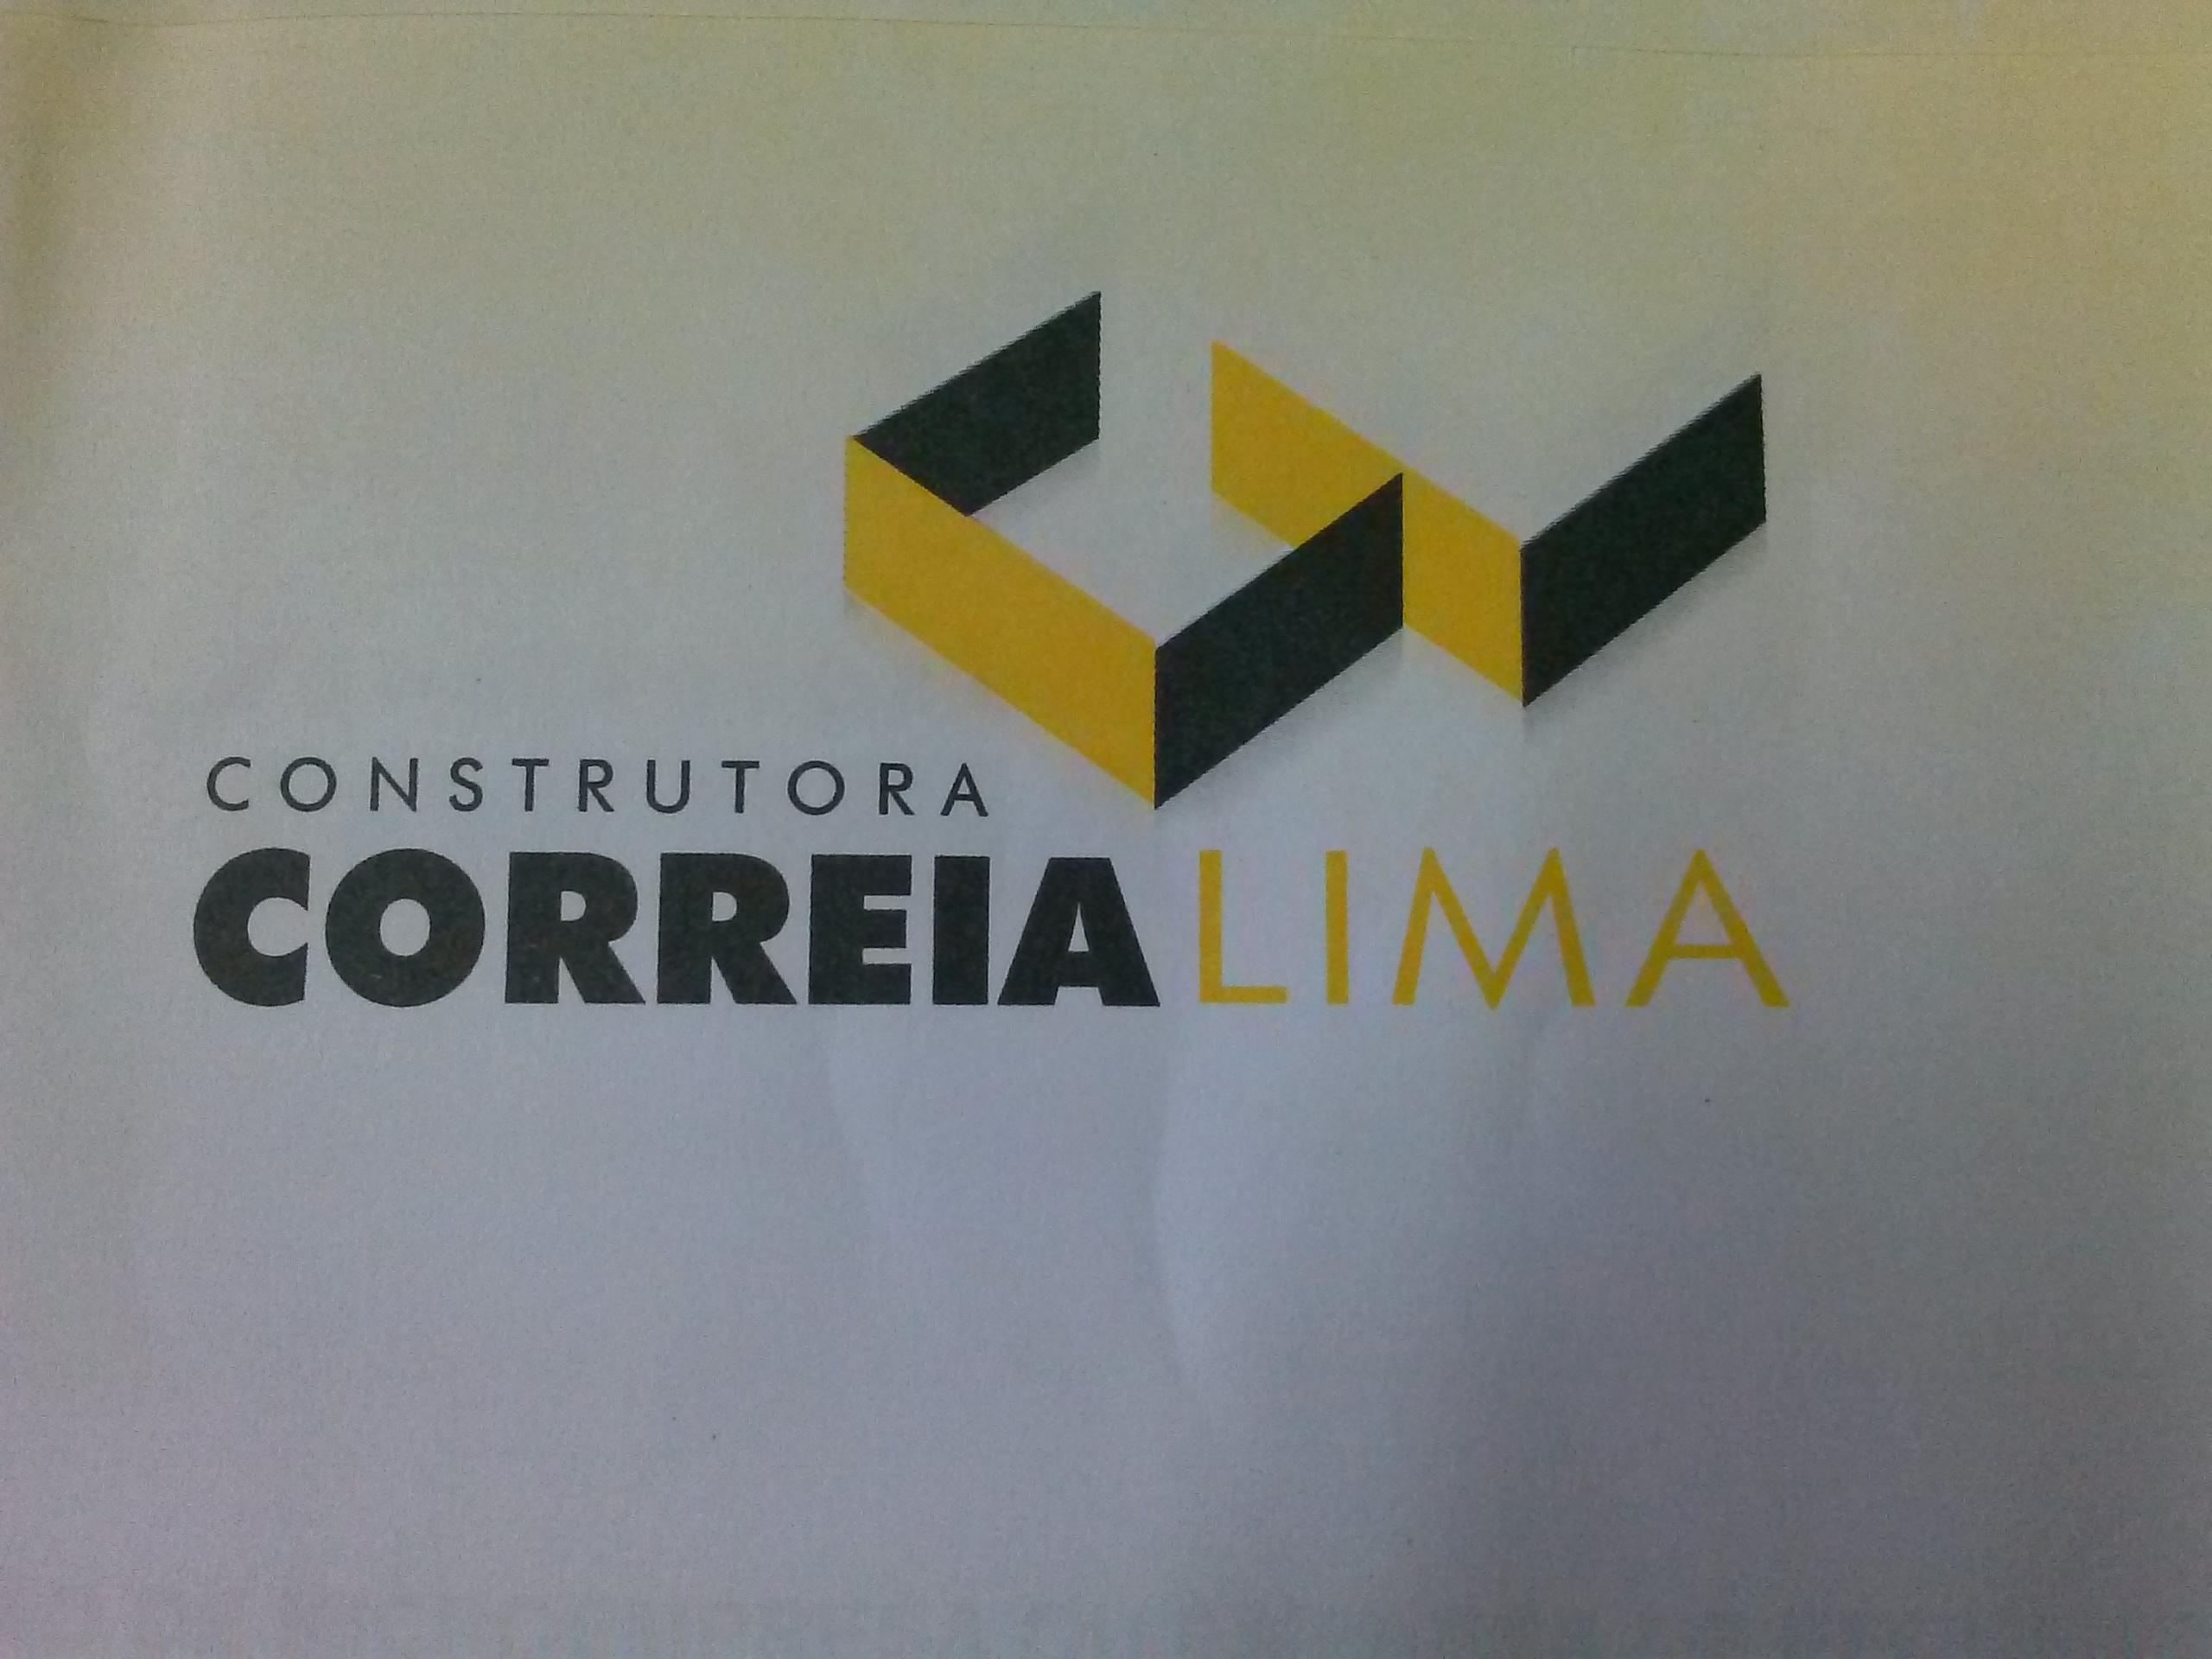 Correia Lima